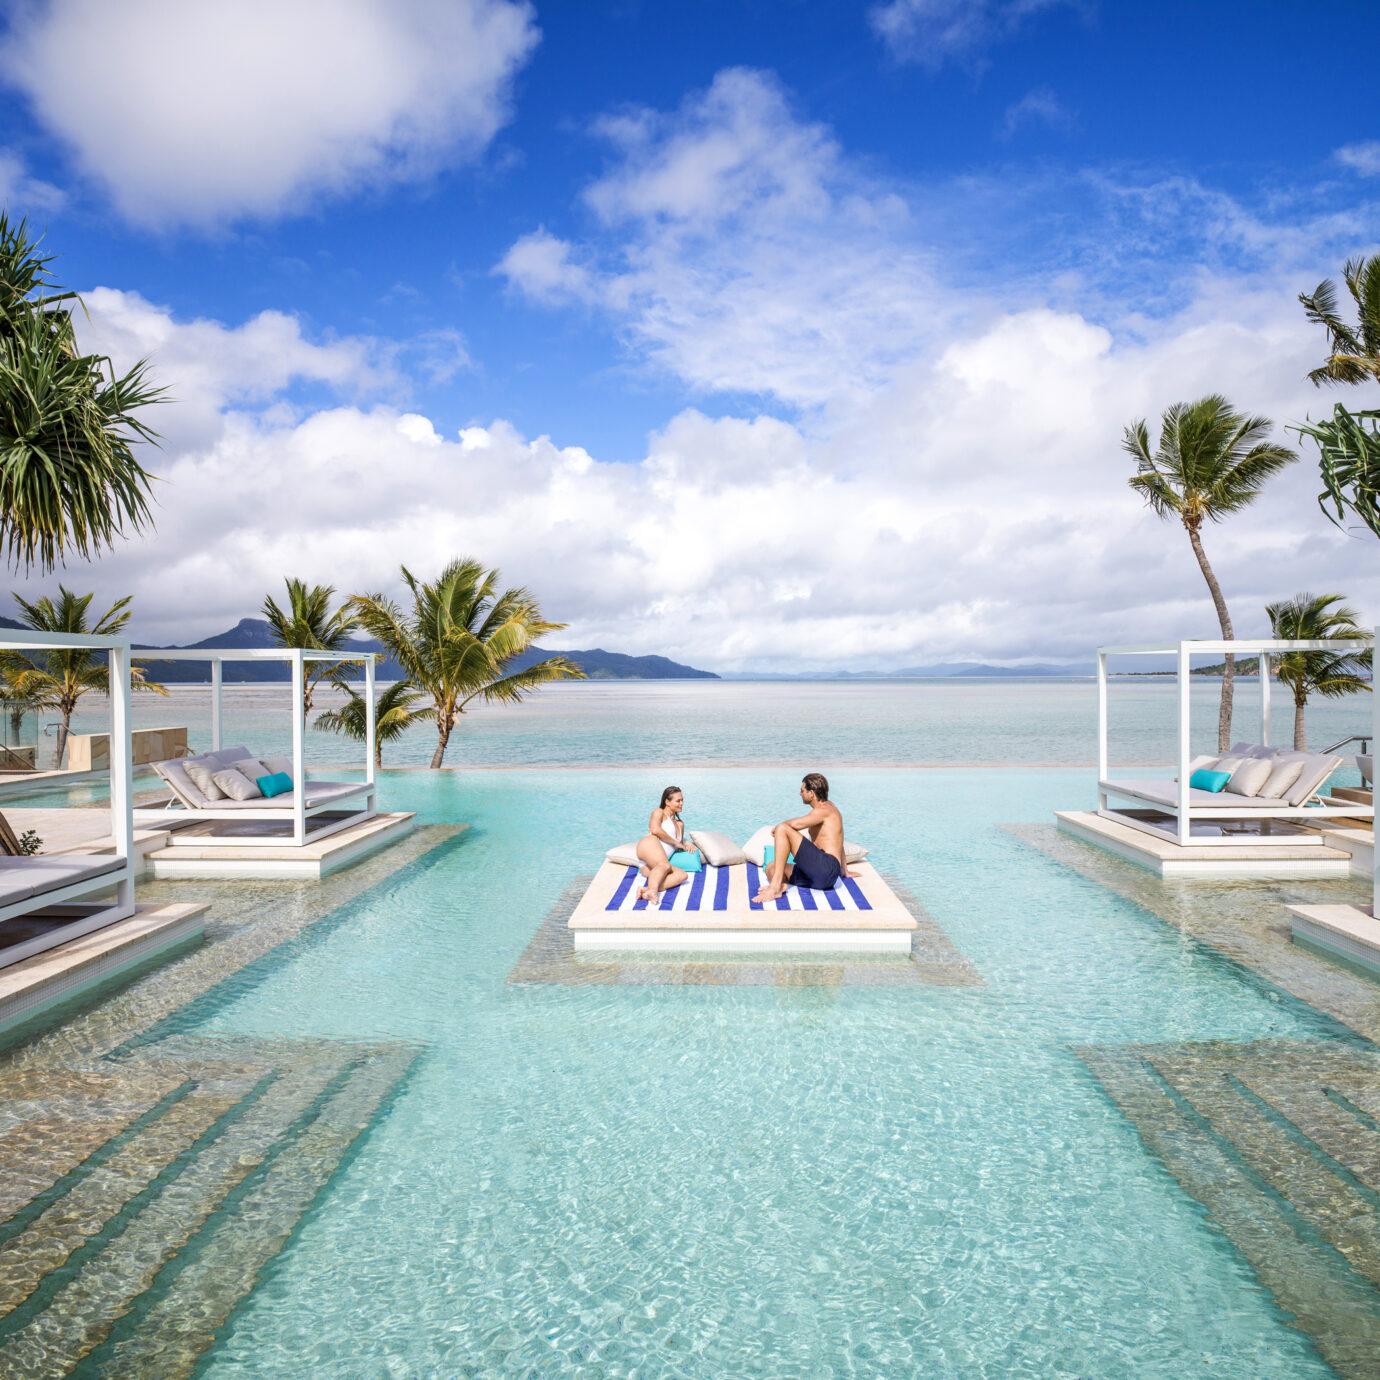 Pool at Hayman Island Resort